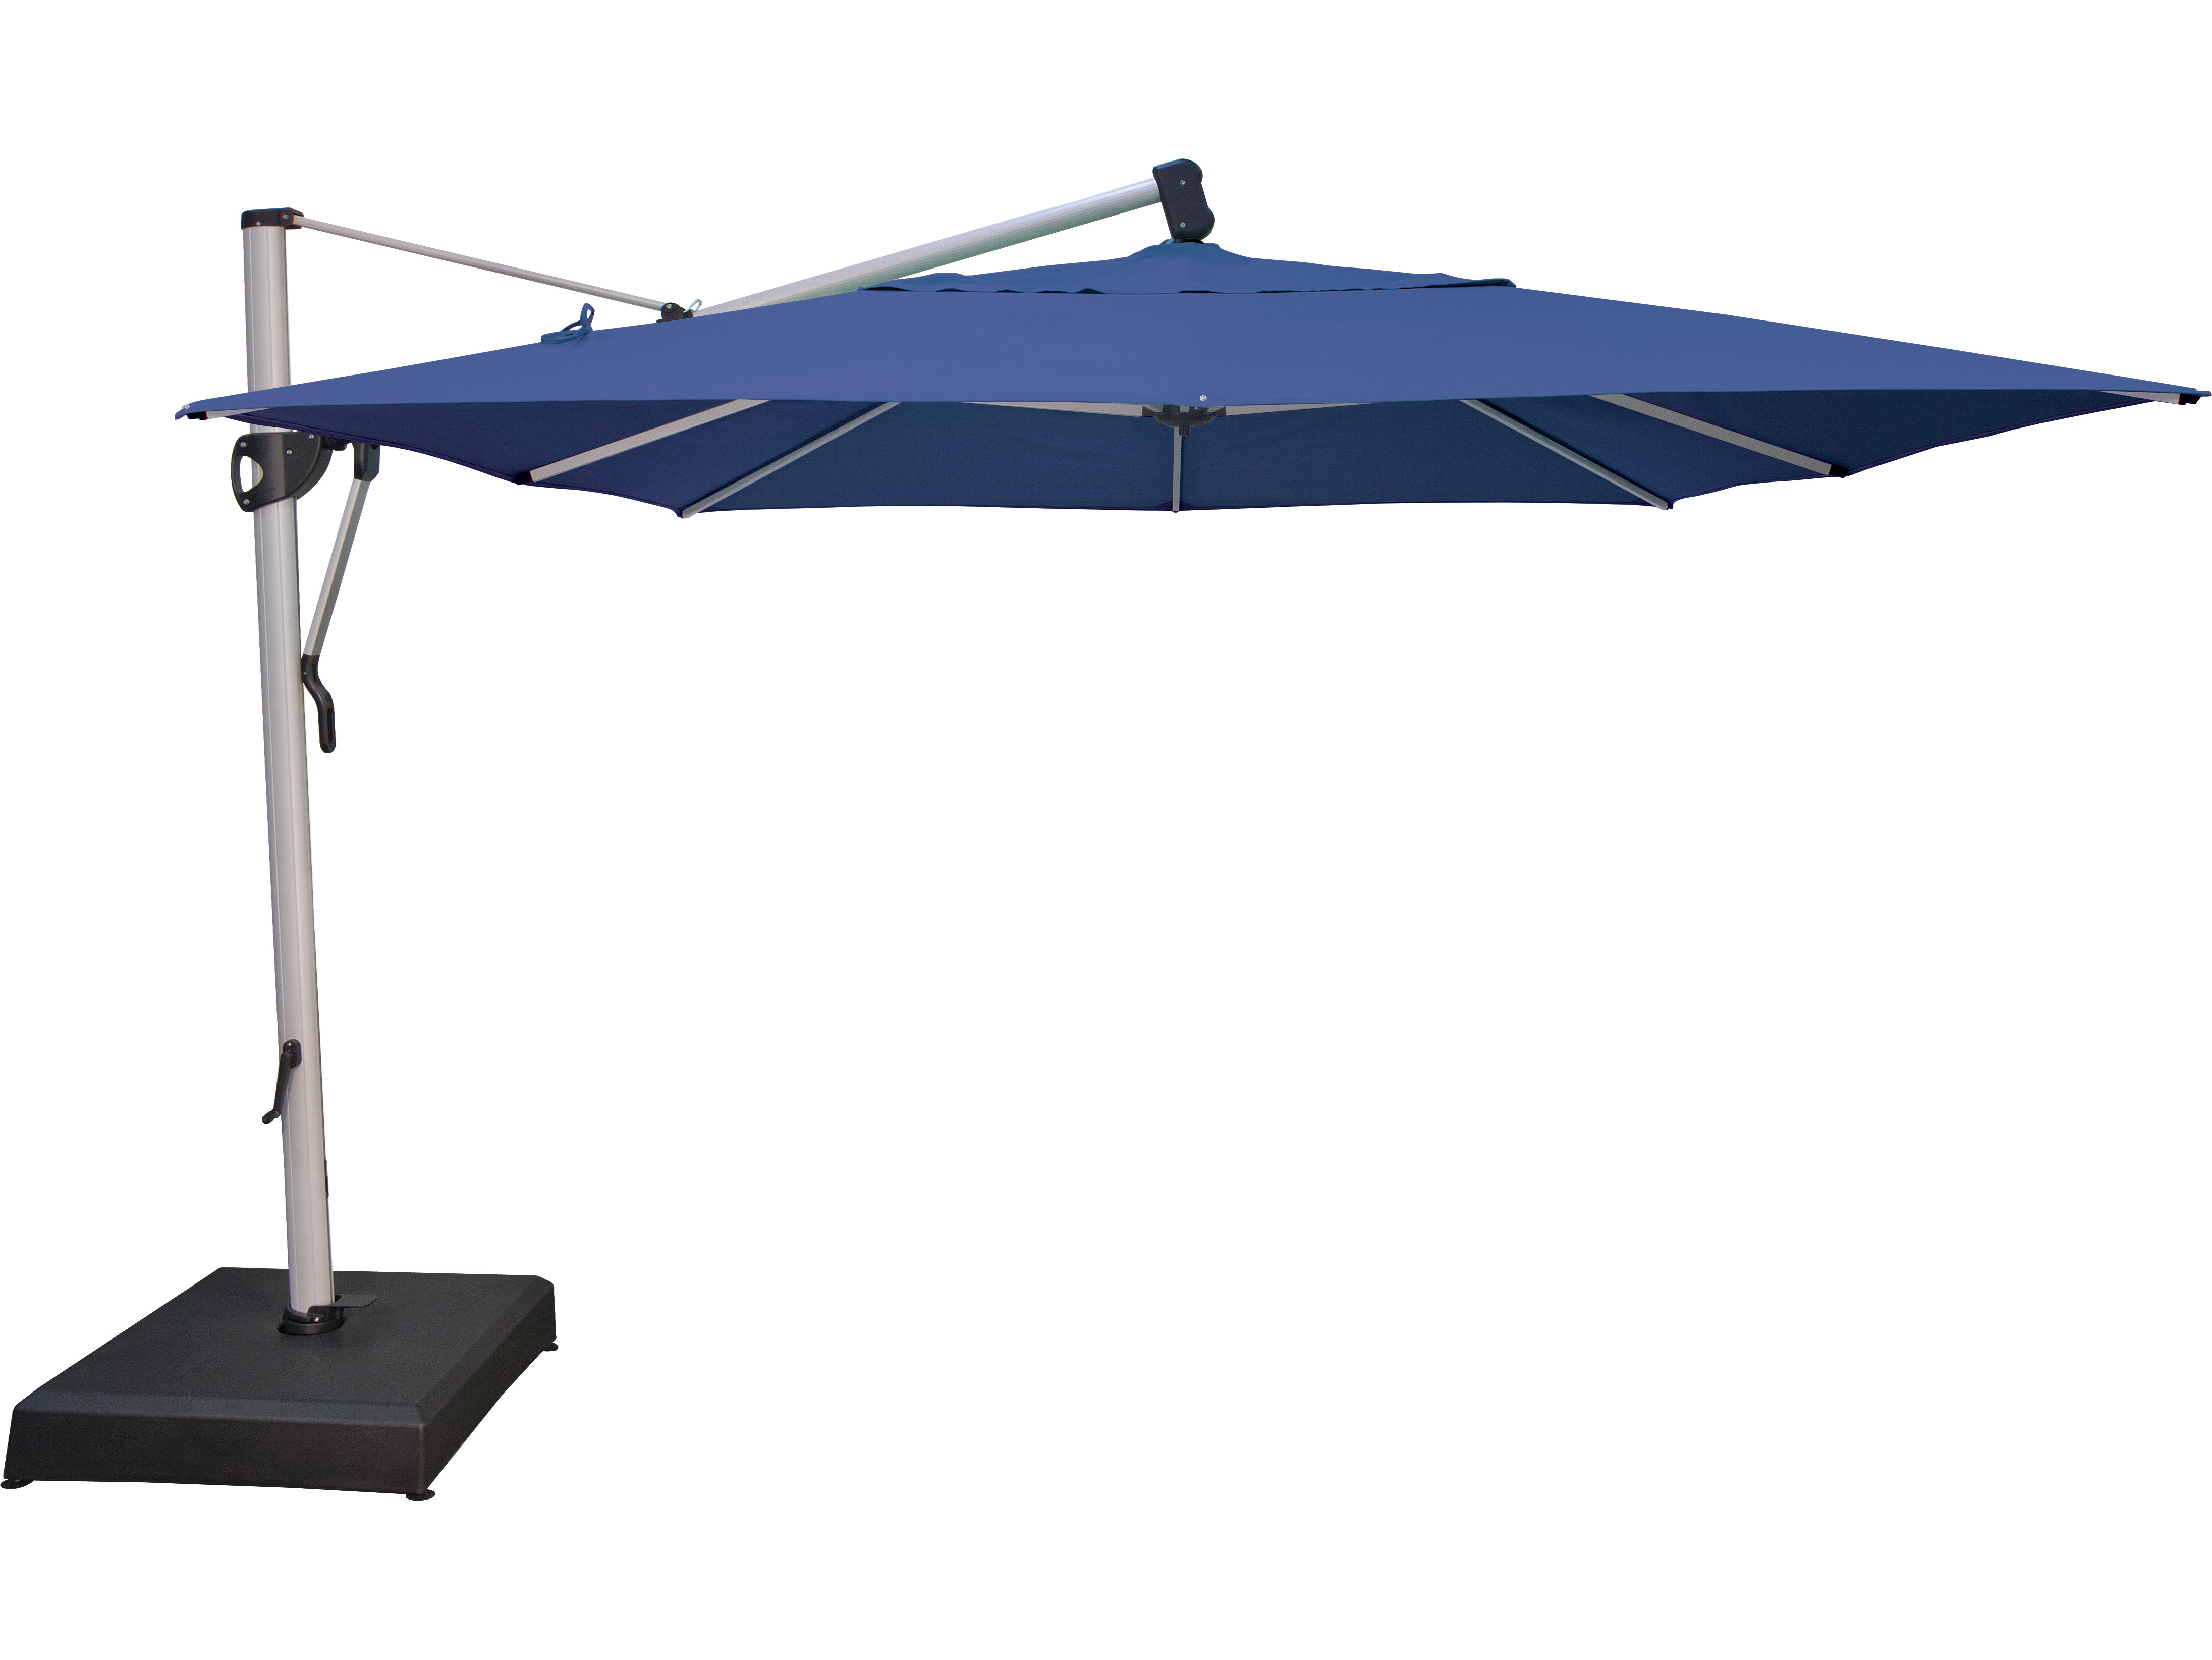 ... Treasure Garden Cantilever Aluminum 10 X 13 Foot Cantilever Umbrella ...